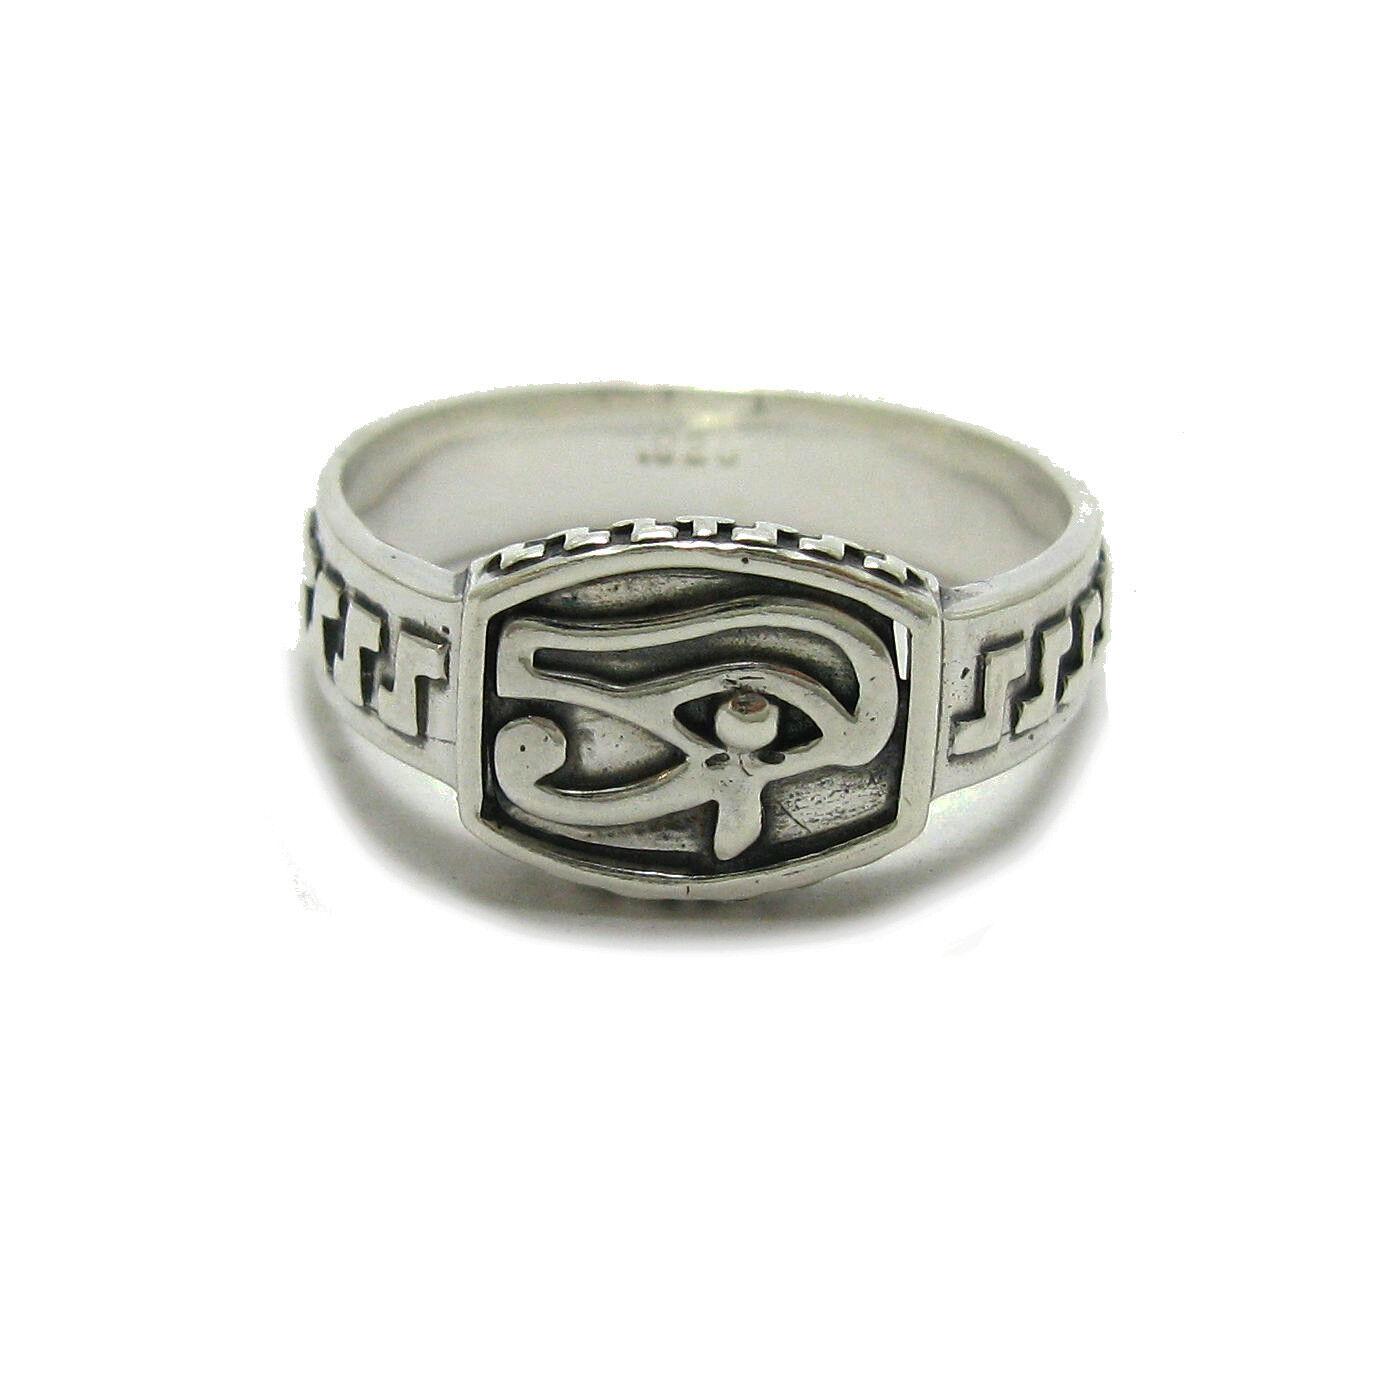 Genuine sterling silver ring Snake solid hallmarked 925 R001843 Empress